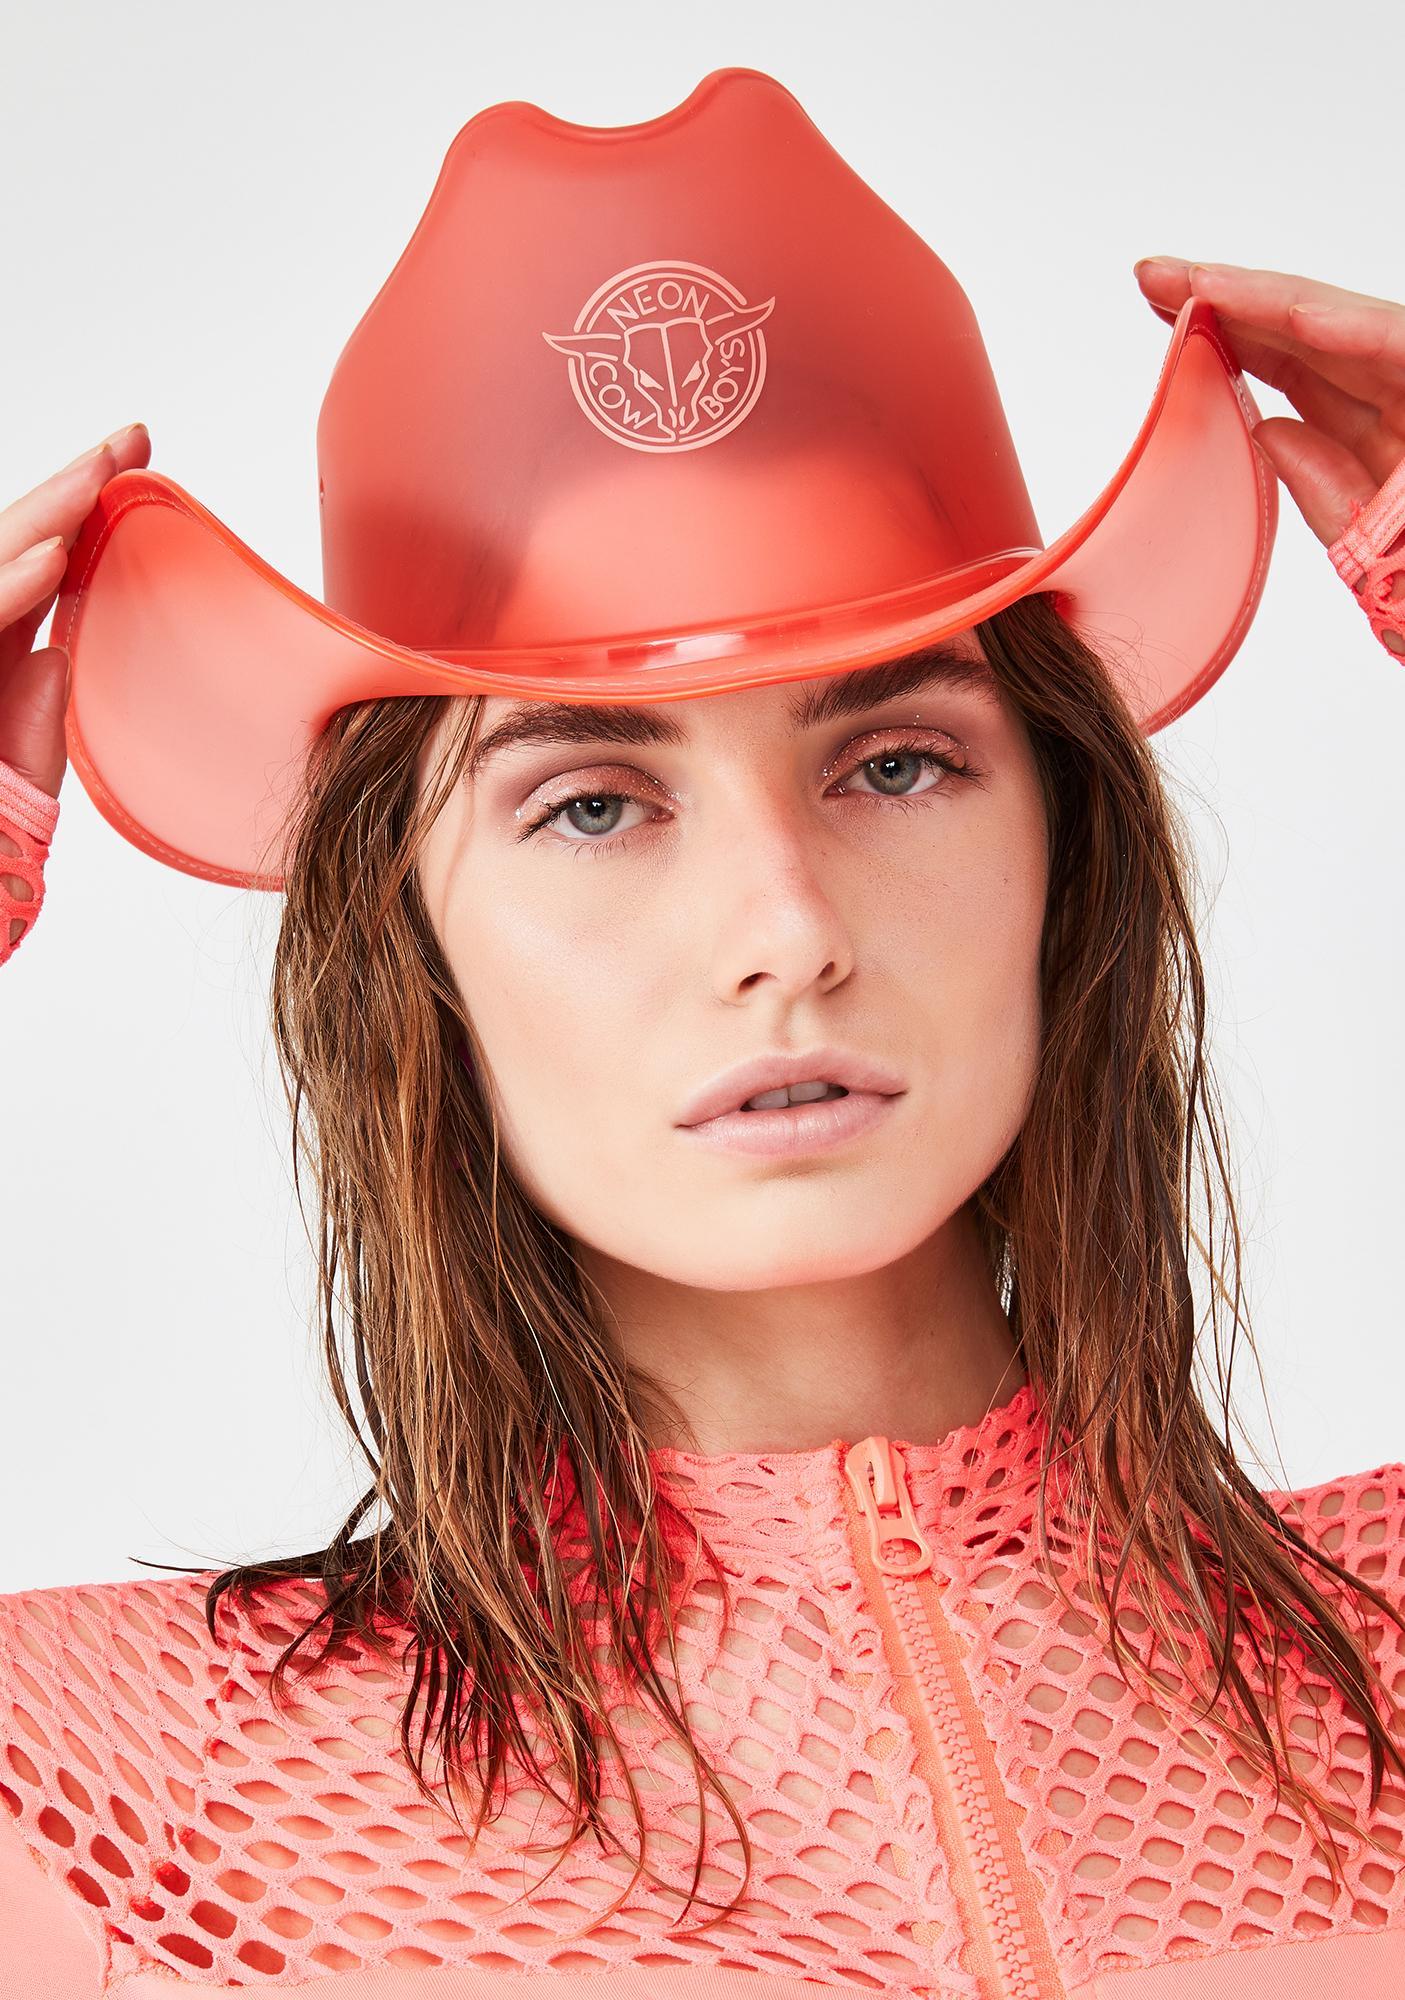 Neon Cowboys Phoenix Red Light Up Cowboy Hat